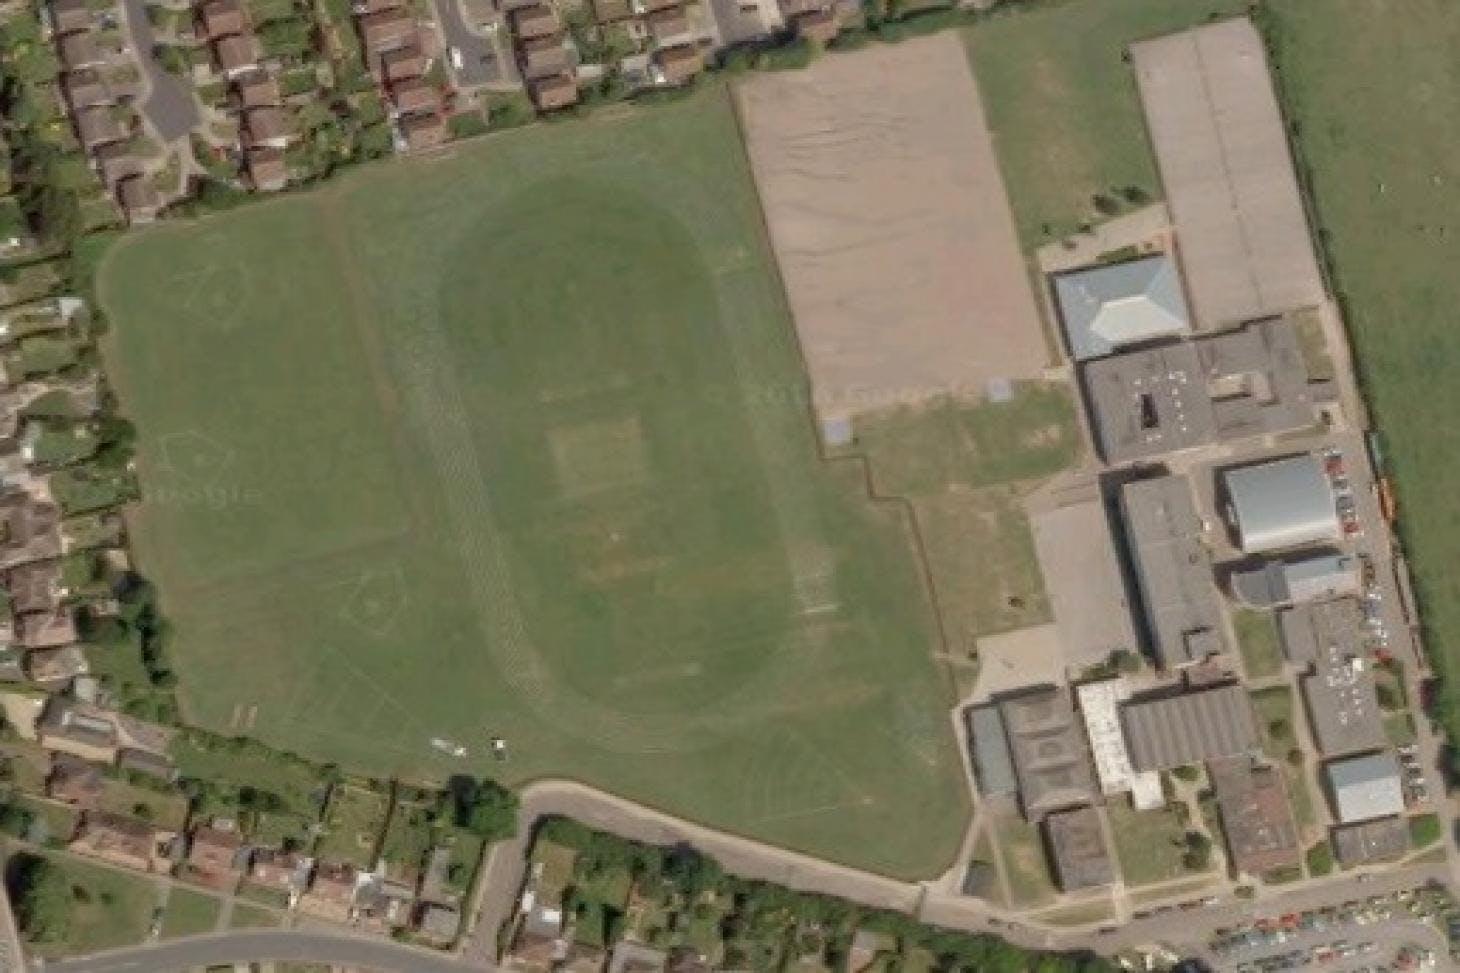 Cardinal Newman Catholic School Full size | Grass cricket facilities